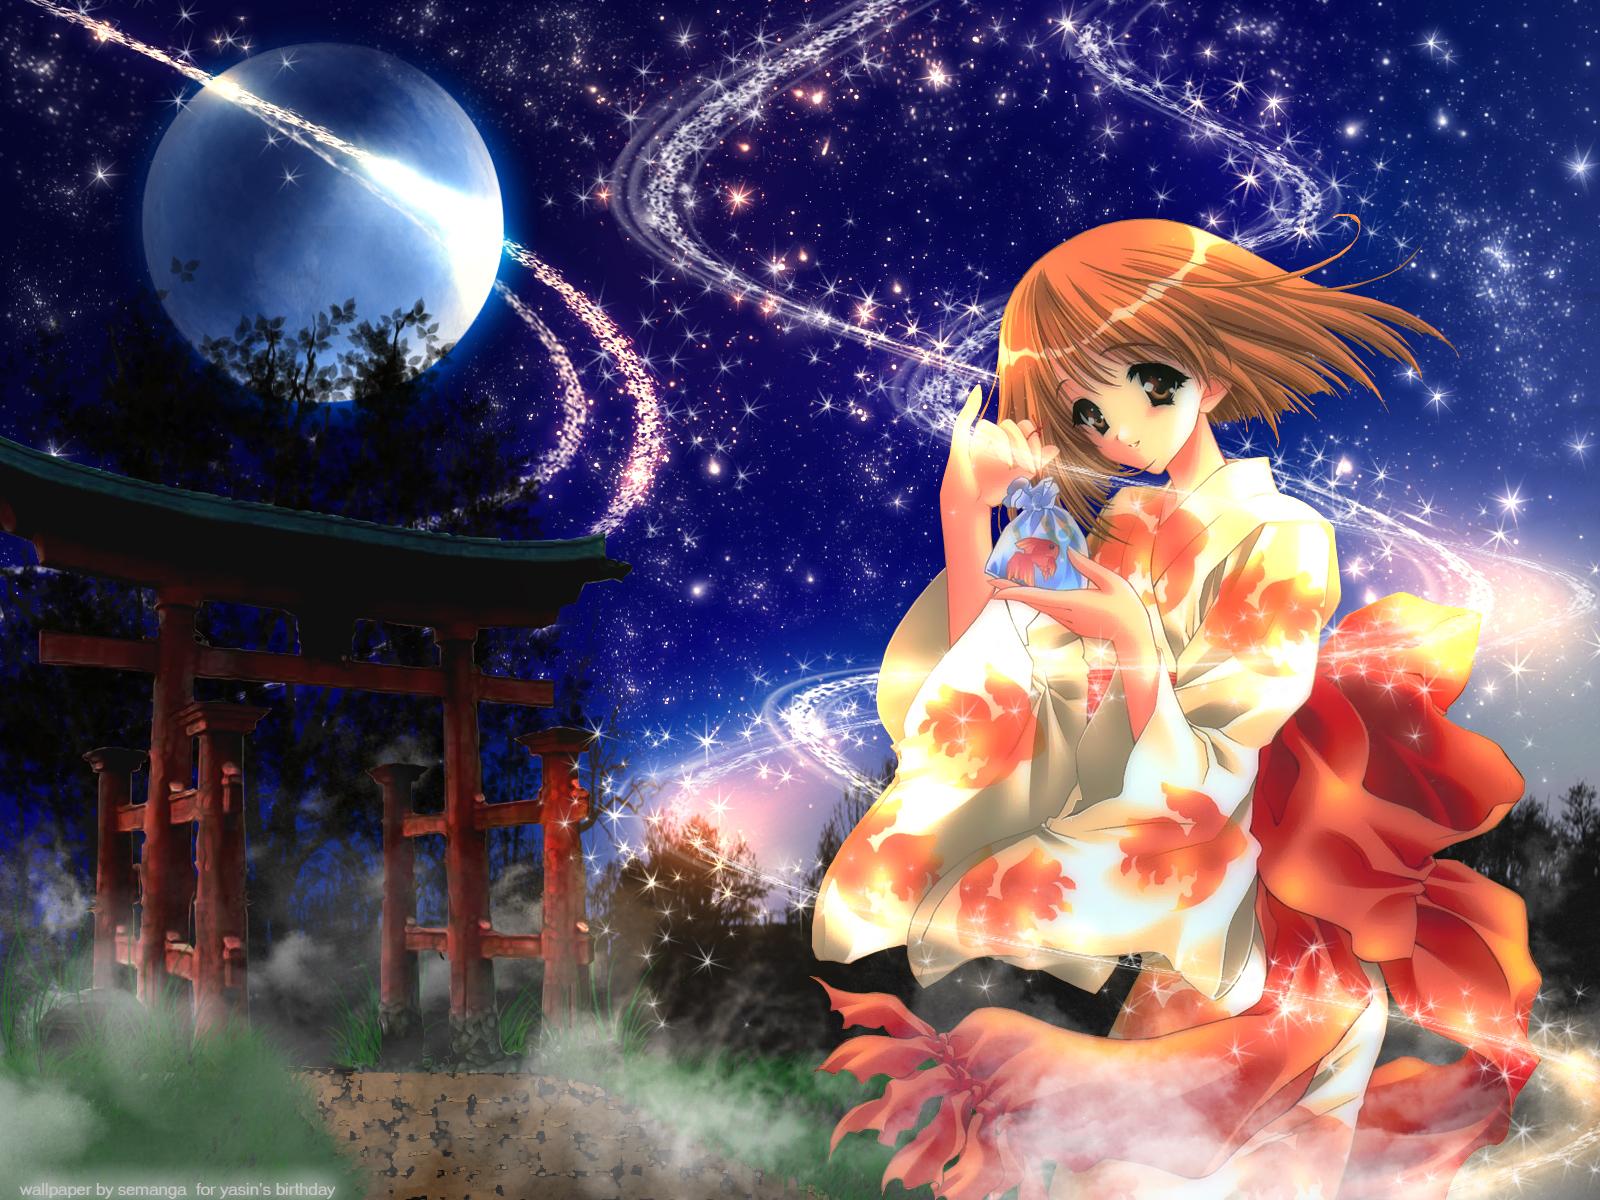 http://2.bp.blogspot.com/-SvgH6GFL1FA/UAa7CtlVLrI/AAAAAAAACyY/3mJ7uZ3BL04/s1600/anime+wallpaper+widescreen+7.jpg